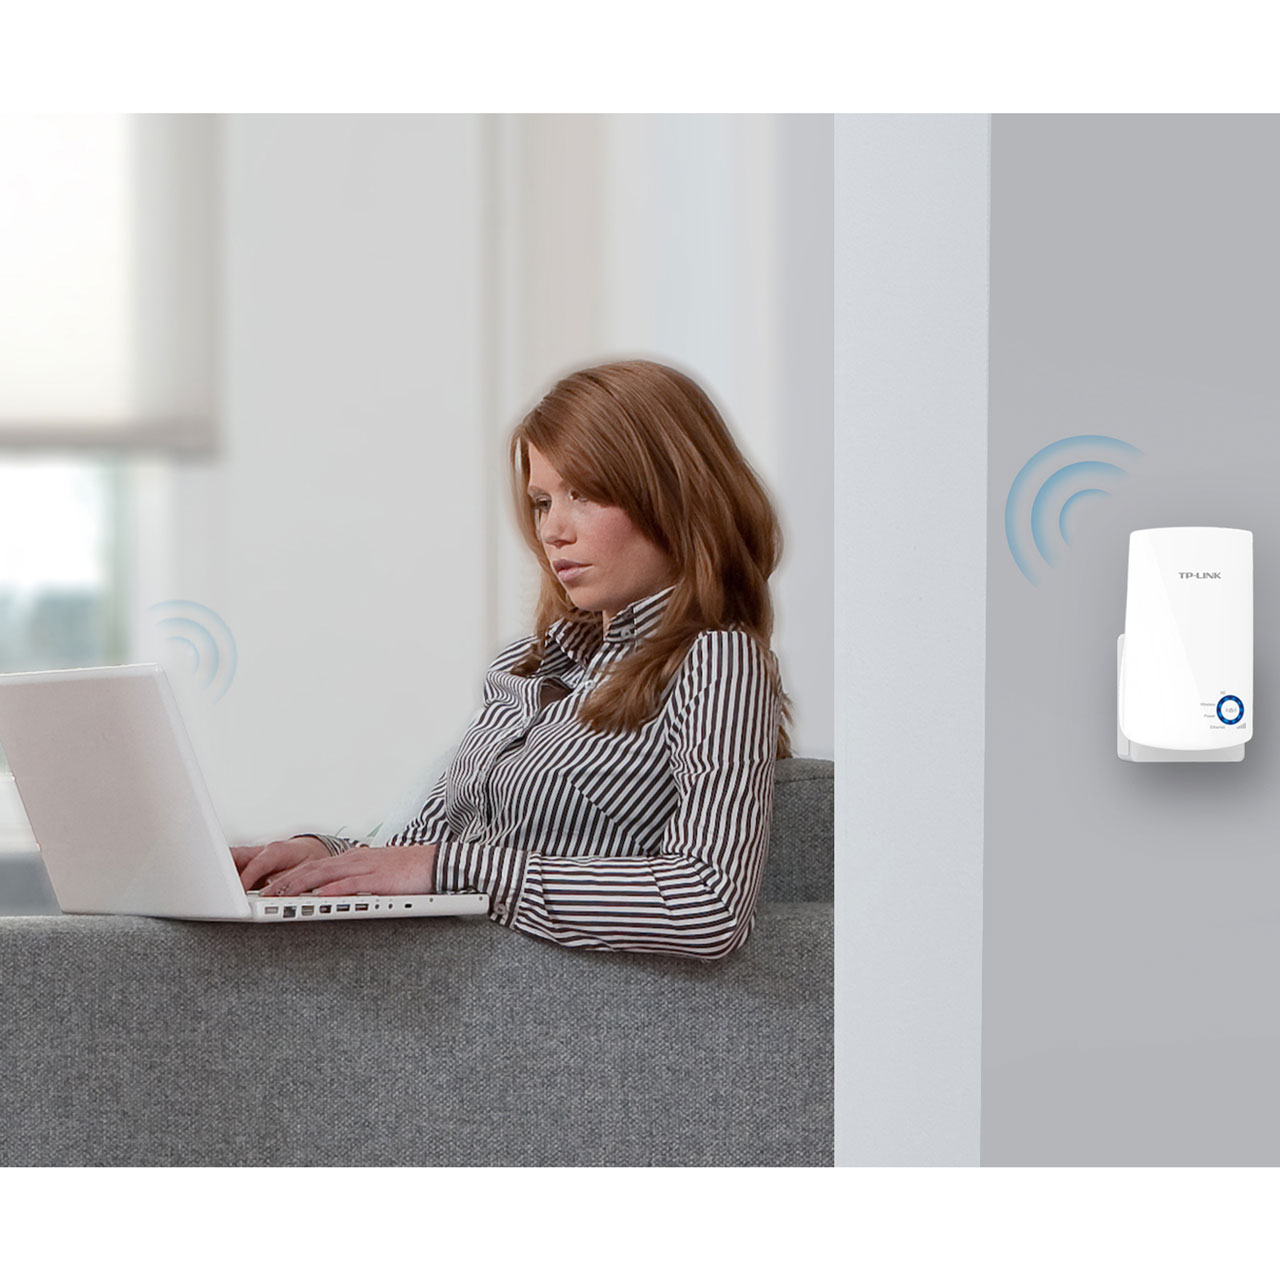 TP-Link Single Band N300 WiFi Range Extender